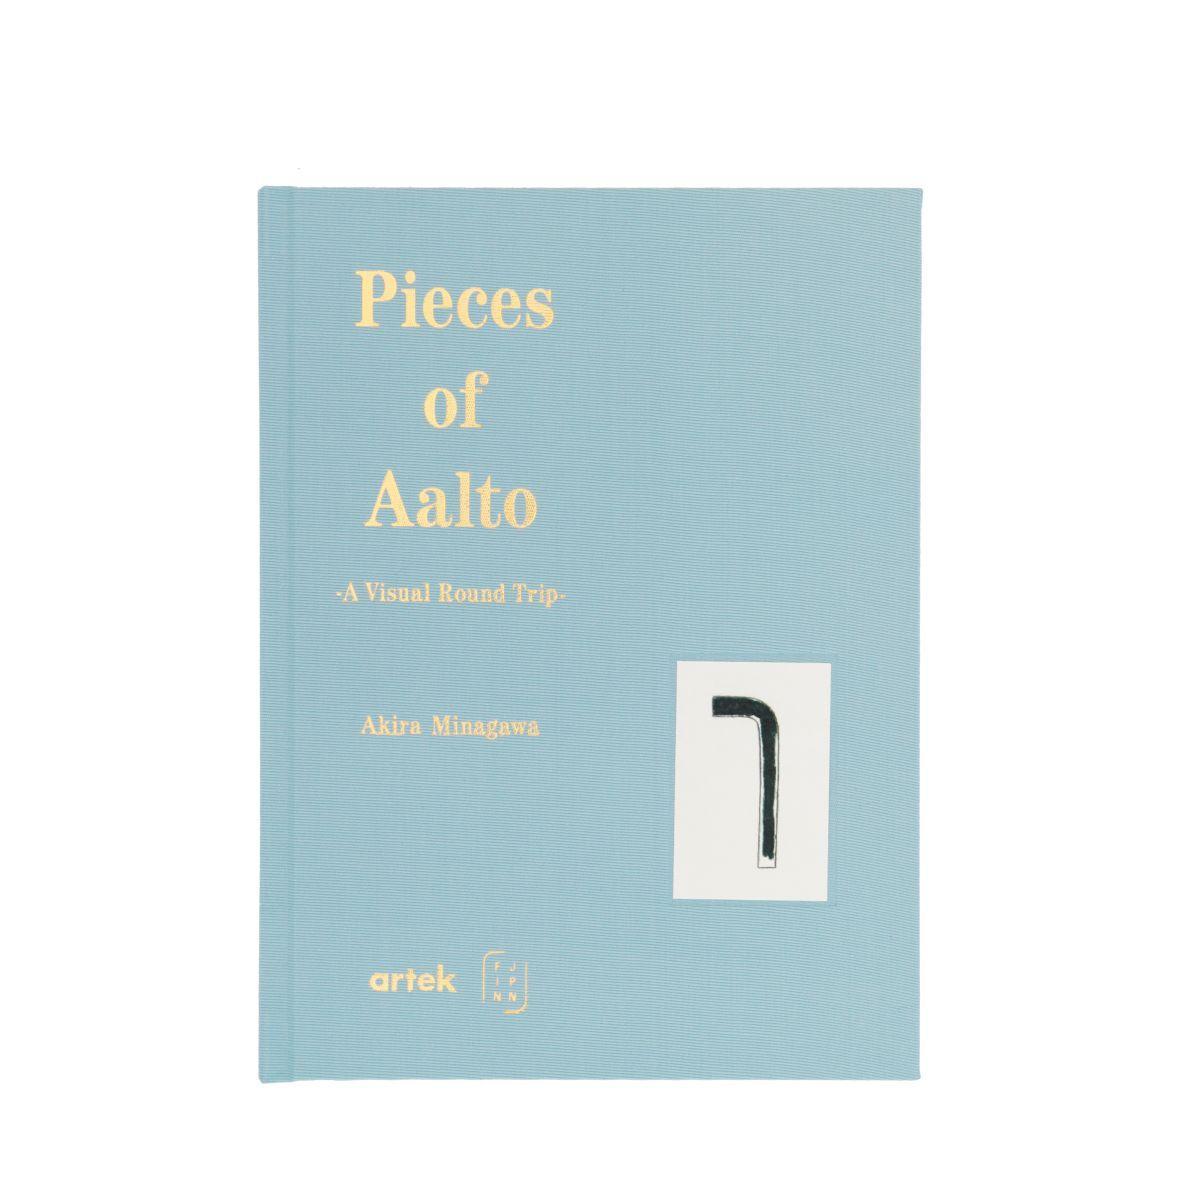 Pieces_of_Aalto_box_F-2681861